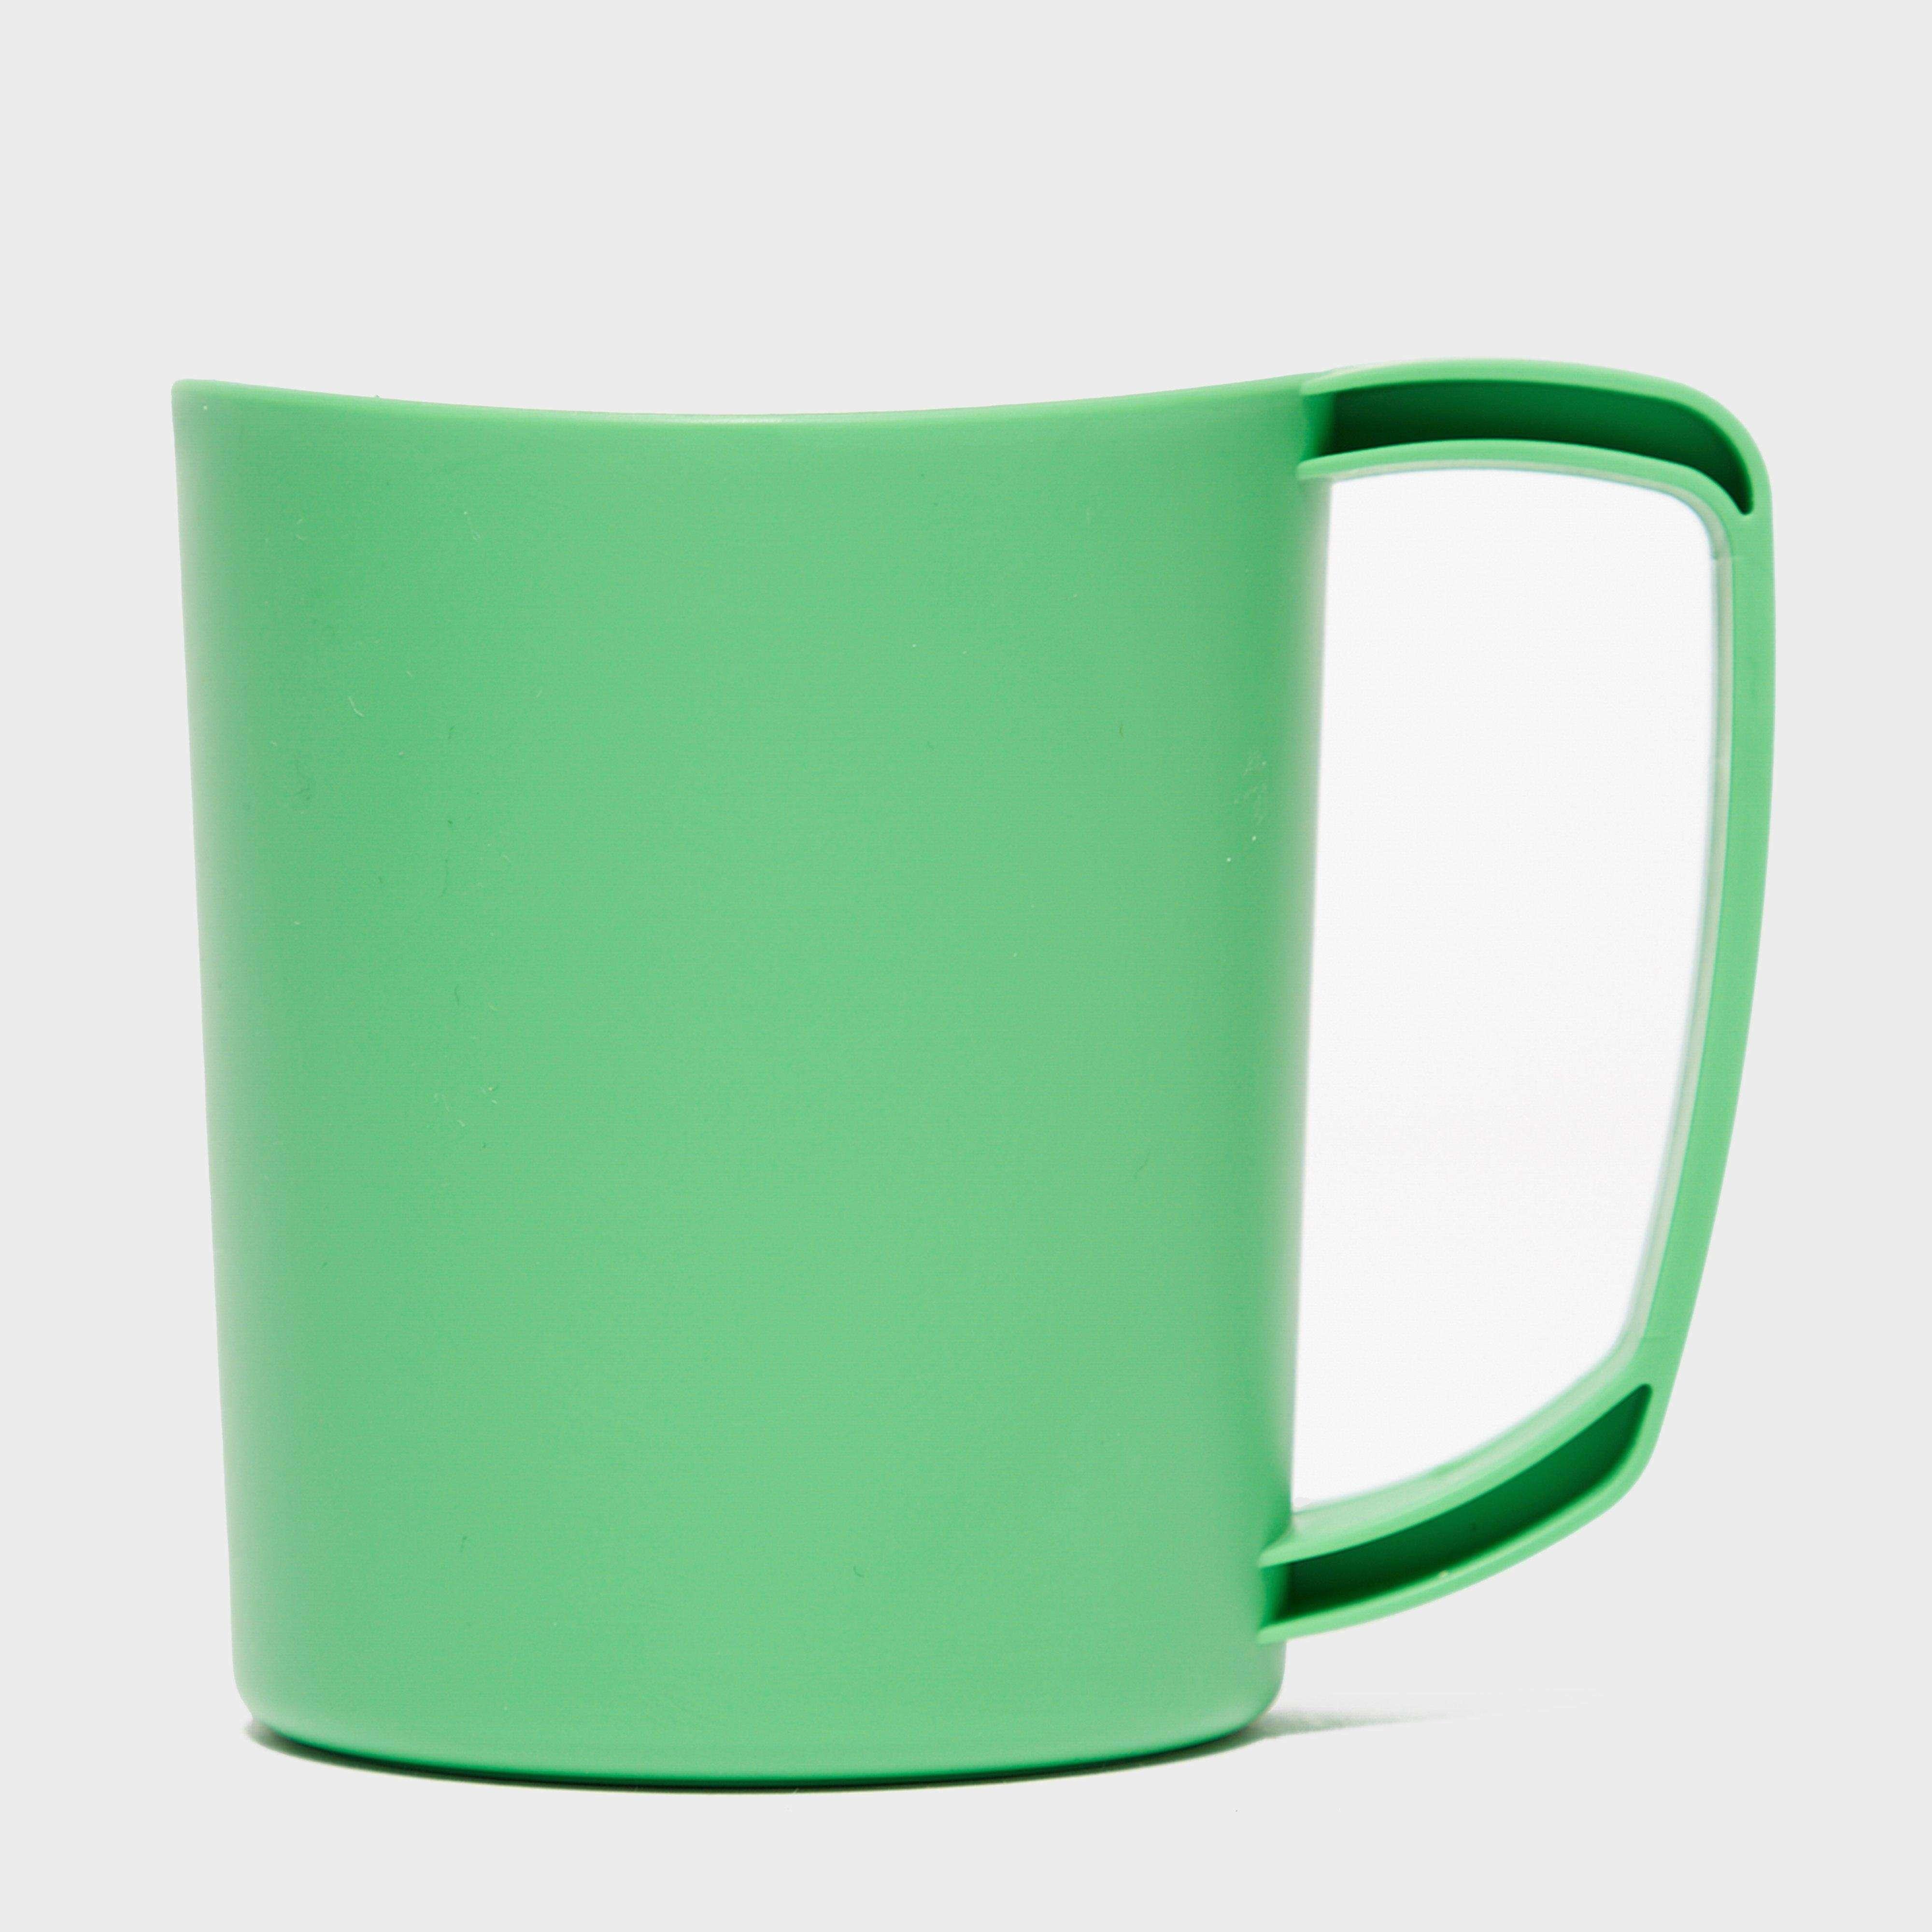 LIFEVENTURE Ellipse Mug